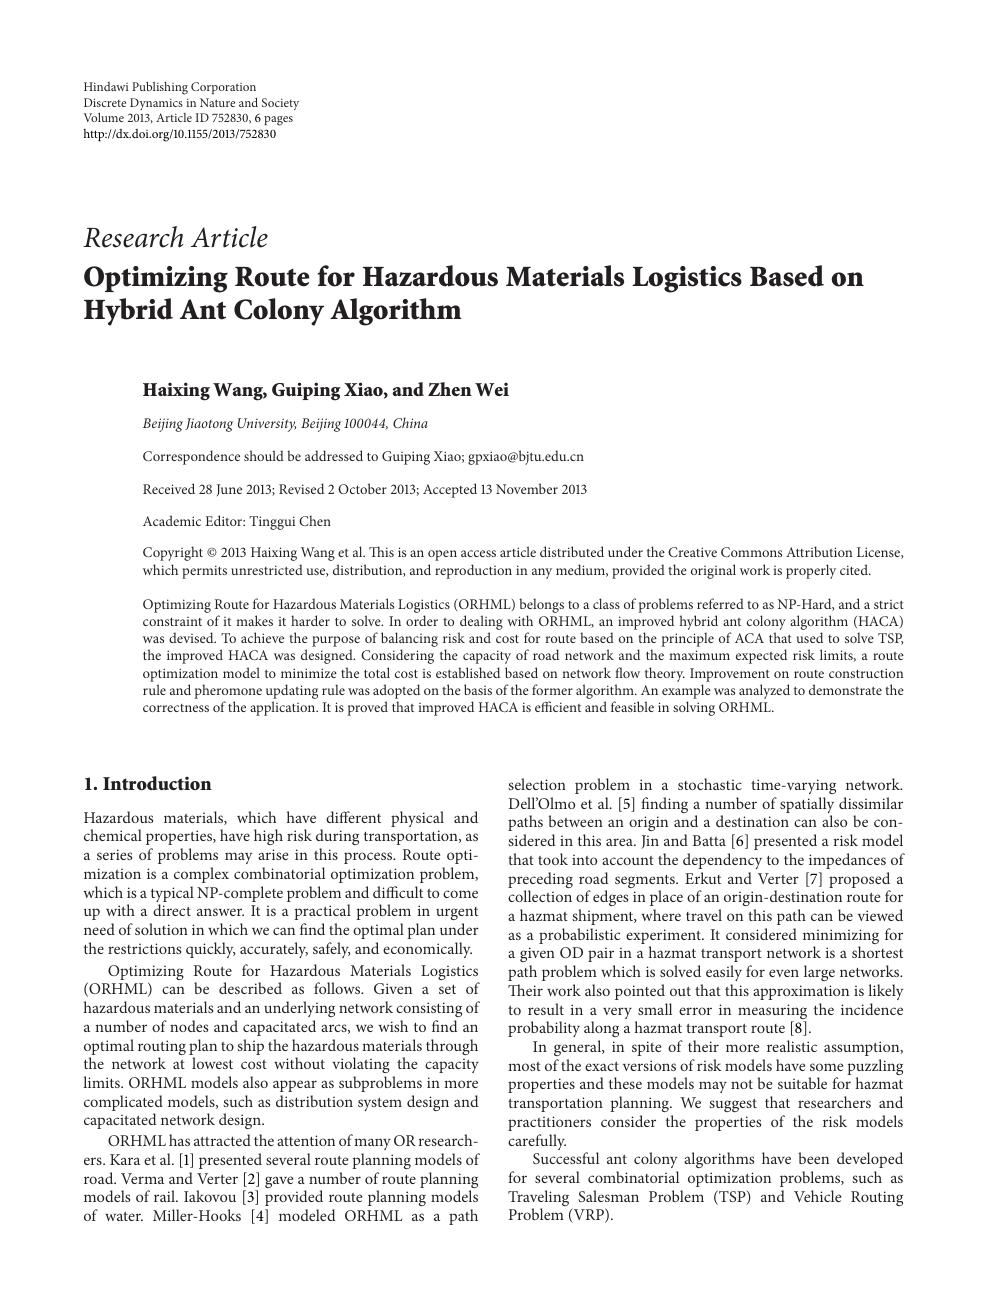 journal of hazardous materials endnote style